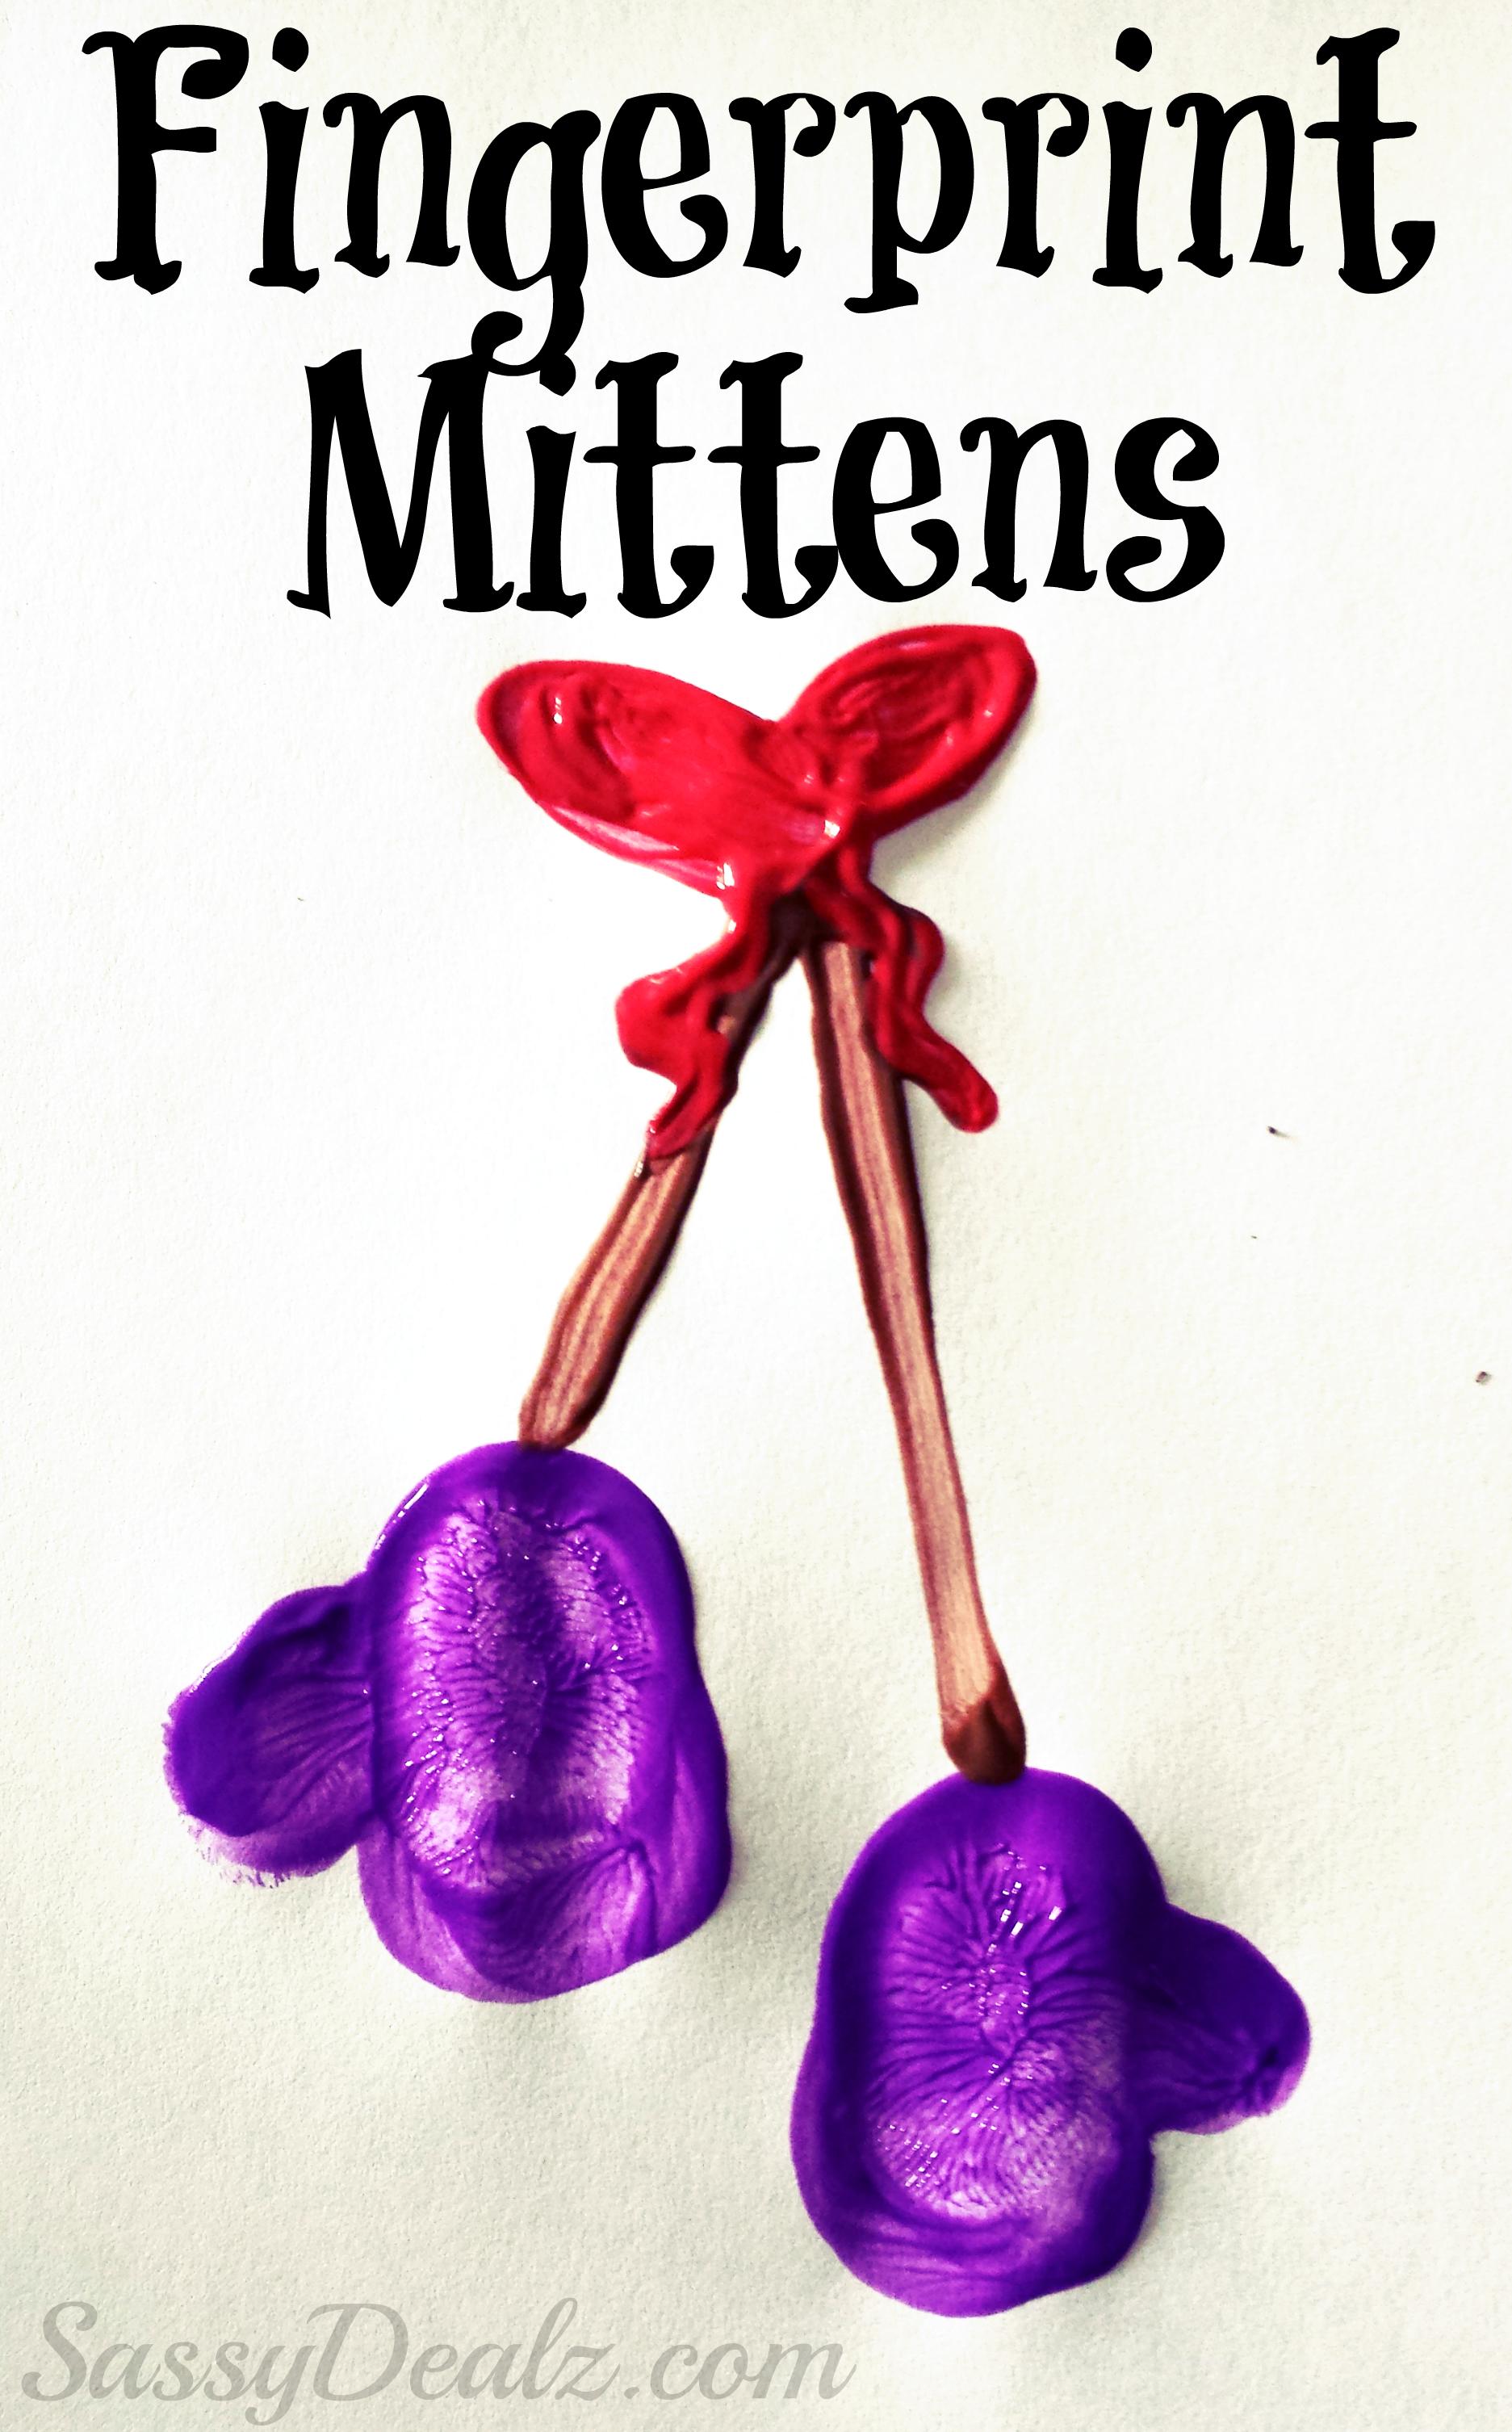 Fingerprint Winter Mittens Craft For Kids #Christmas Craft For Kids